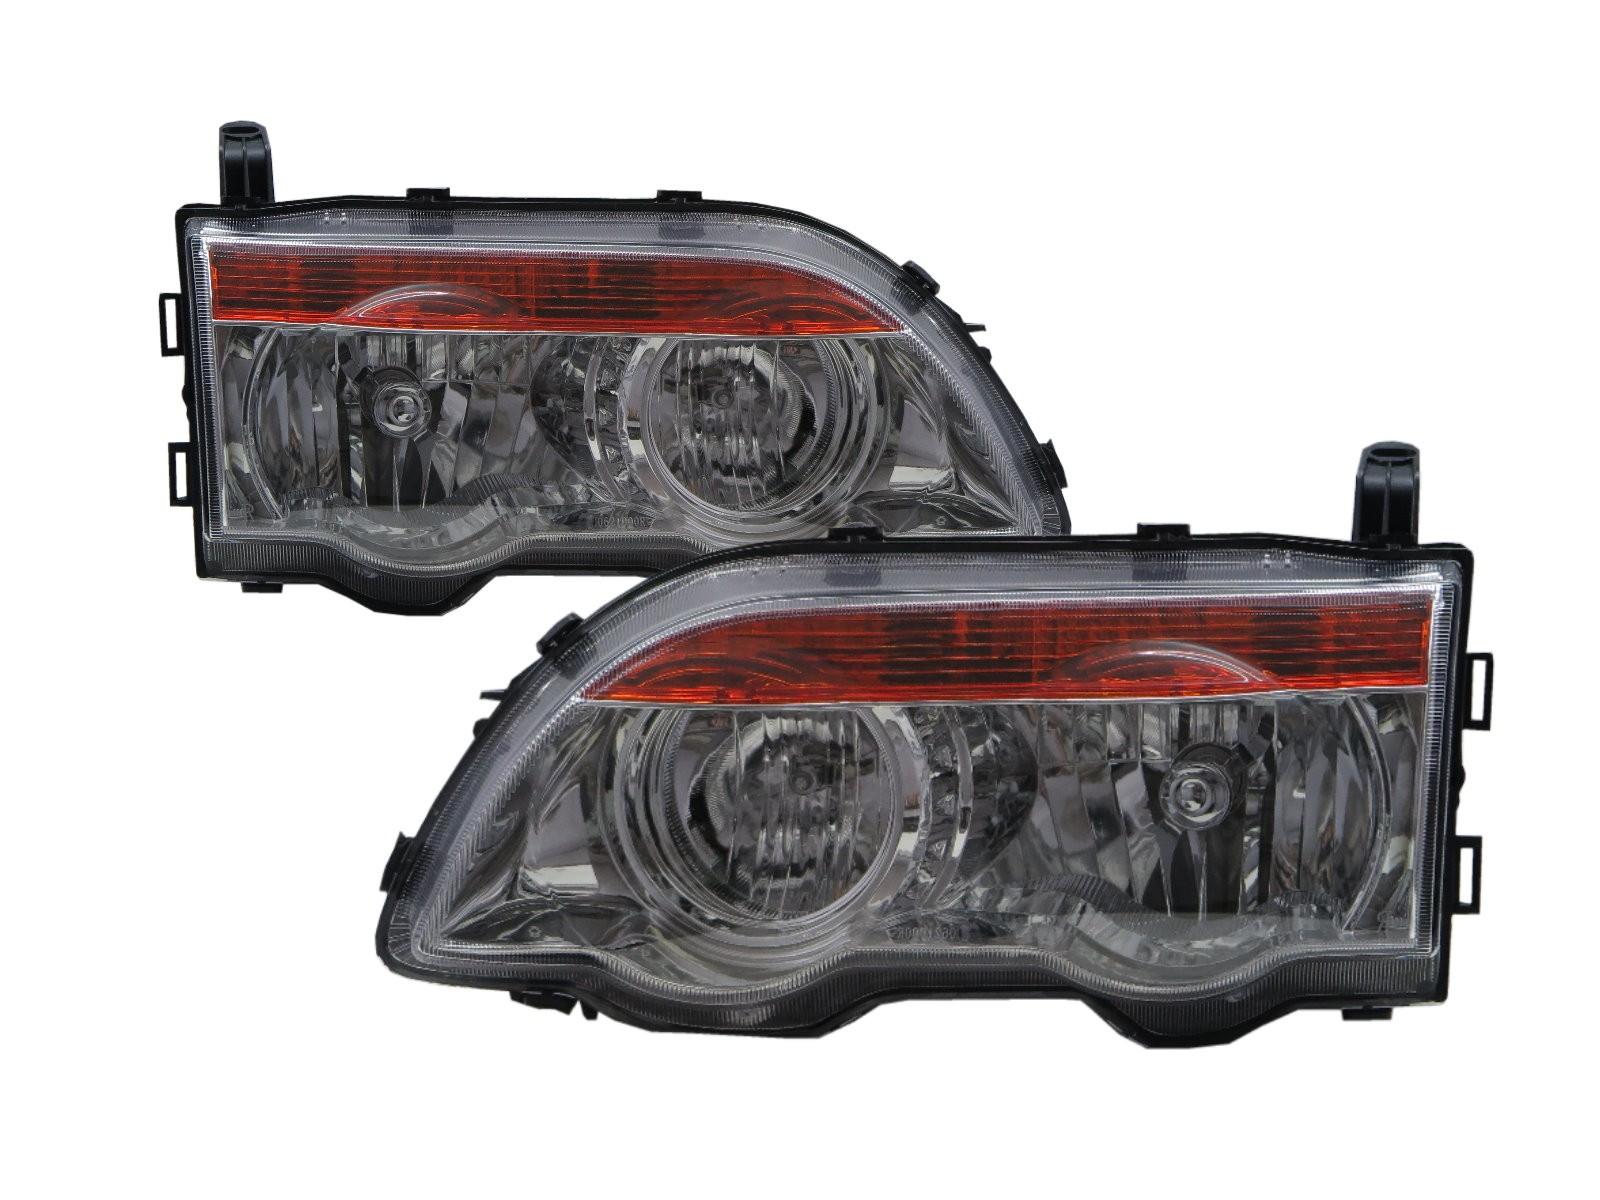 CrazyTheGod Space Gear L400 Fourth generation 2005-2008 Facelift Minivan 4D Clear Headlight Headlamp Chrome for Mitsubishi LHD